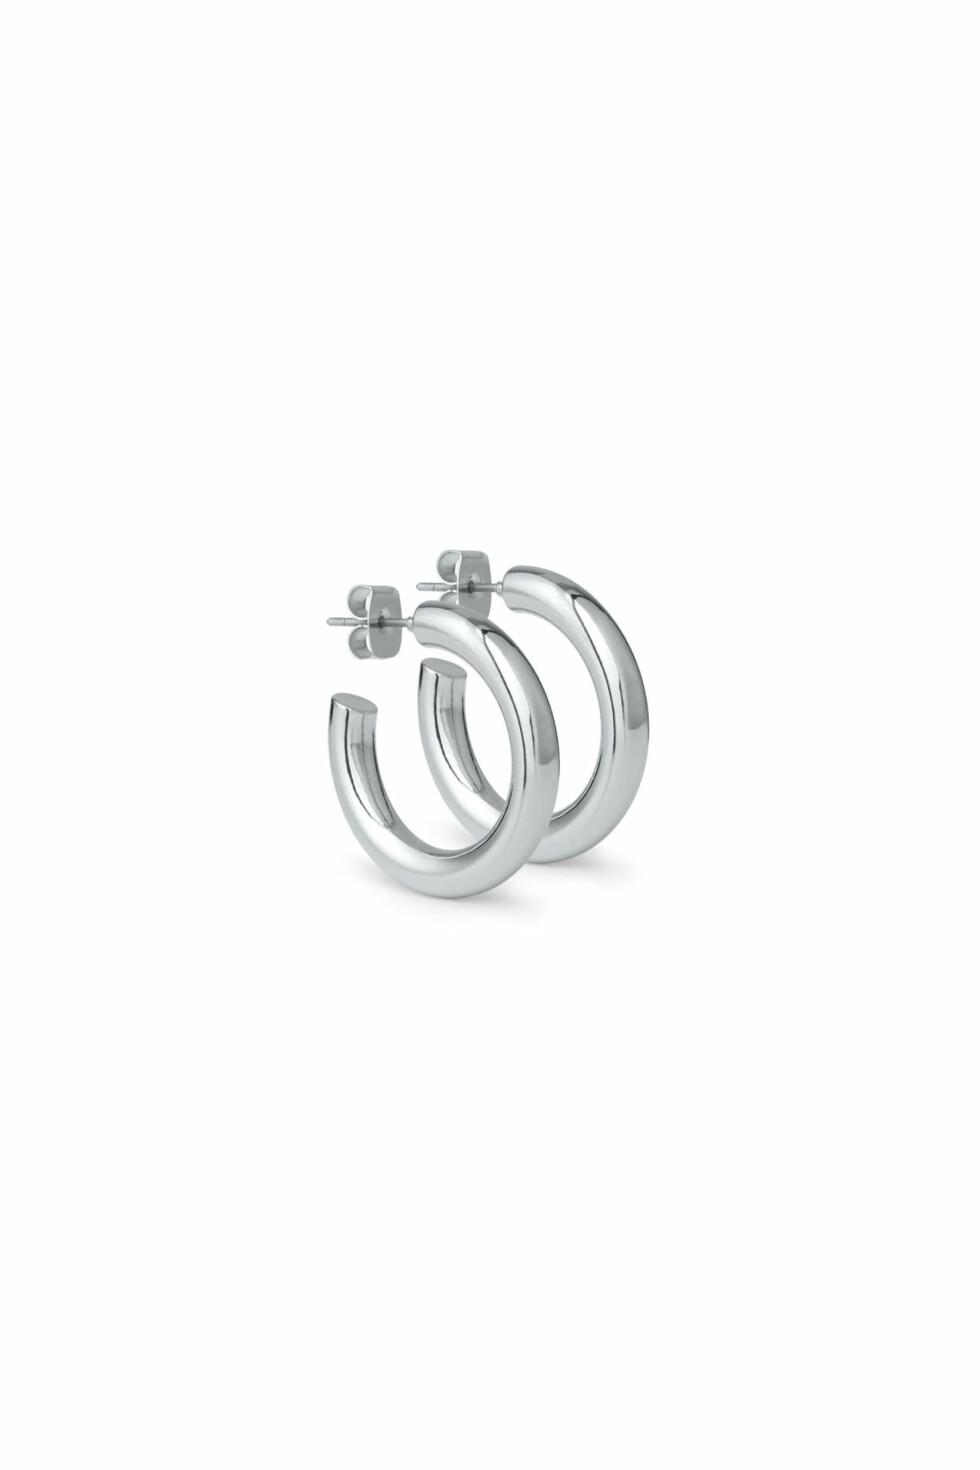 Øredobber fra Weekday |60,-| https://www.weekday.com/en_sek/women/categories/jewellery/product.thick-hoop-earrings-silver.0378427002.html